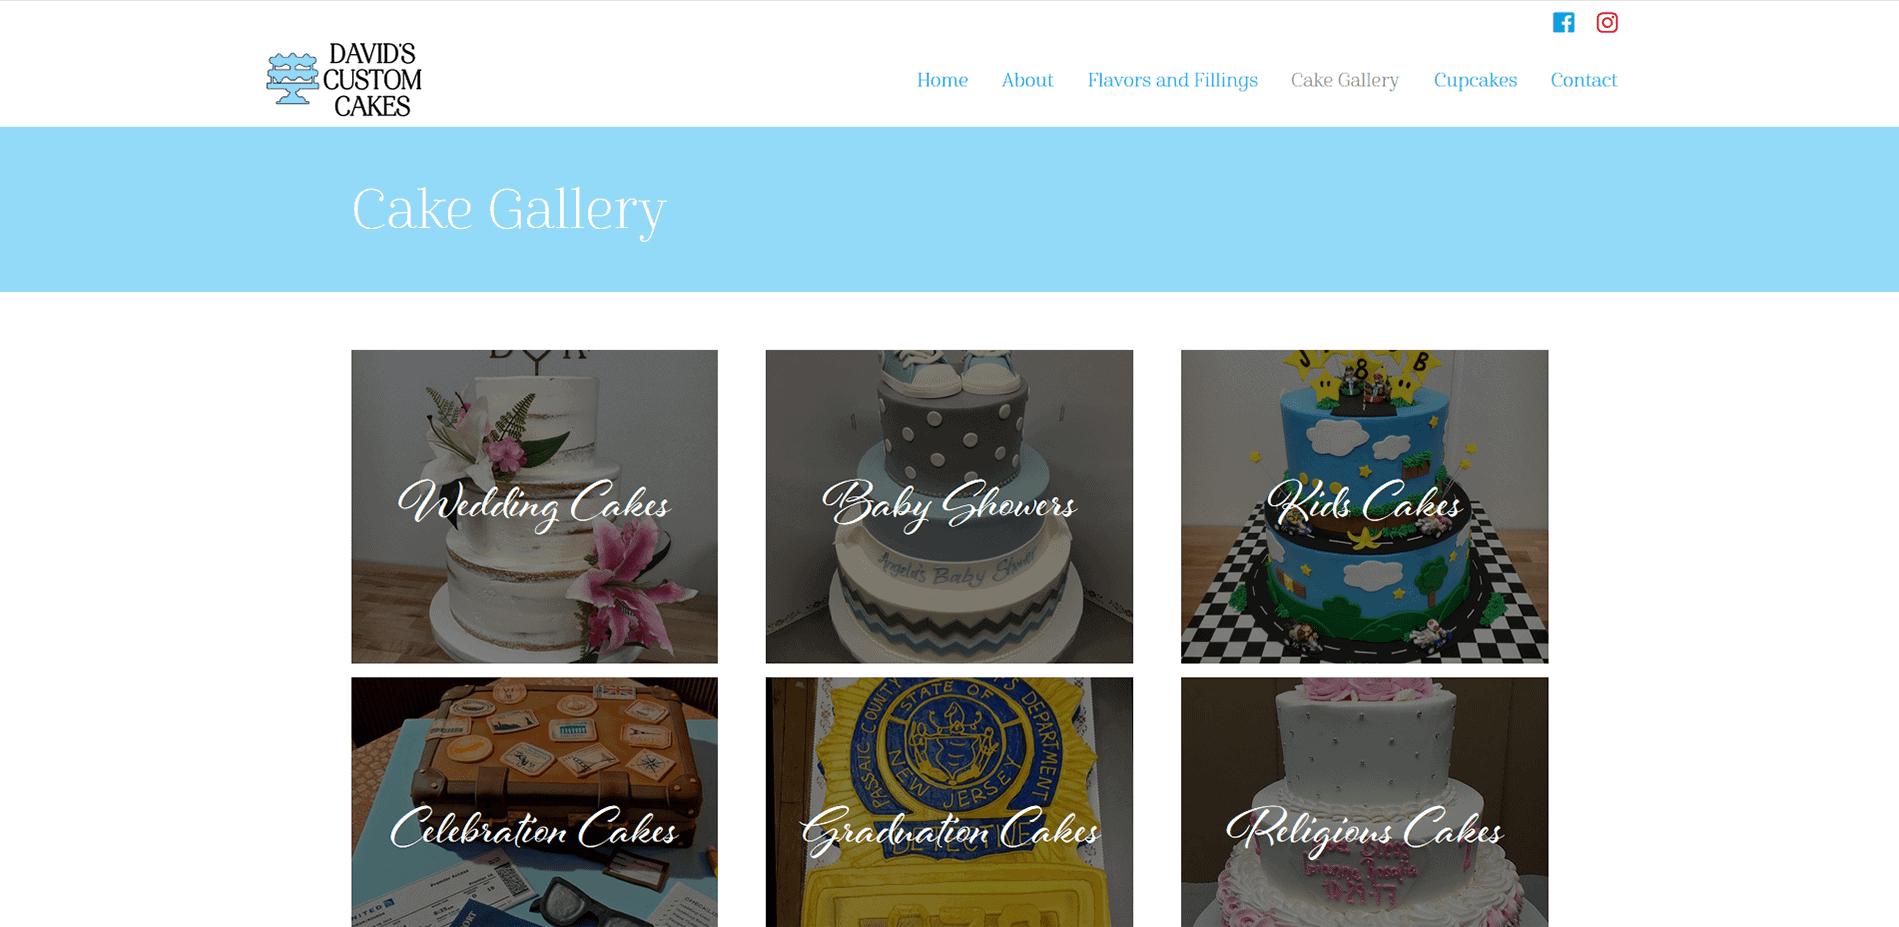 David's Custom Cakes Gallery